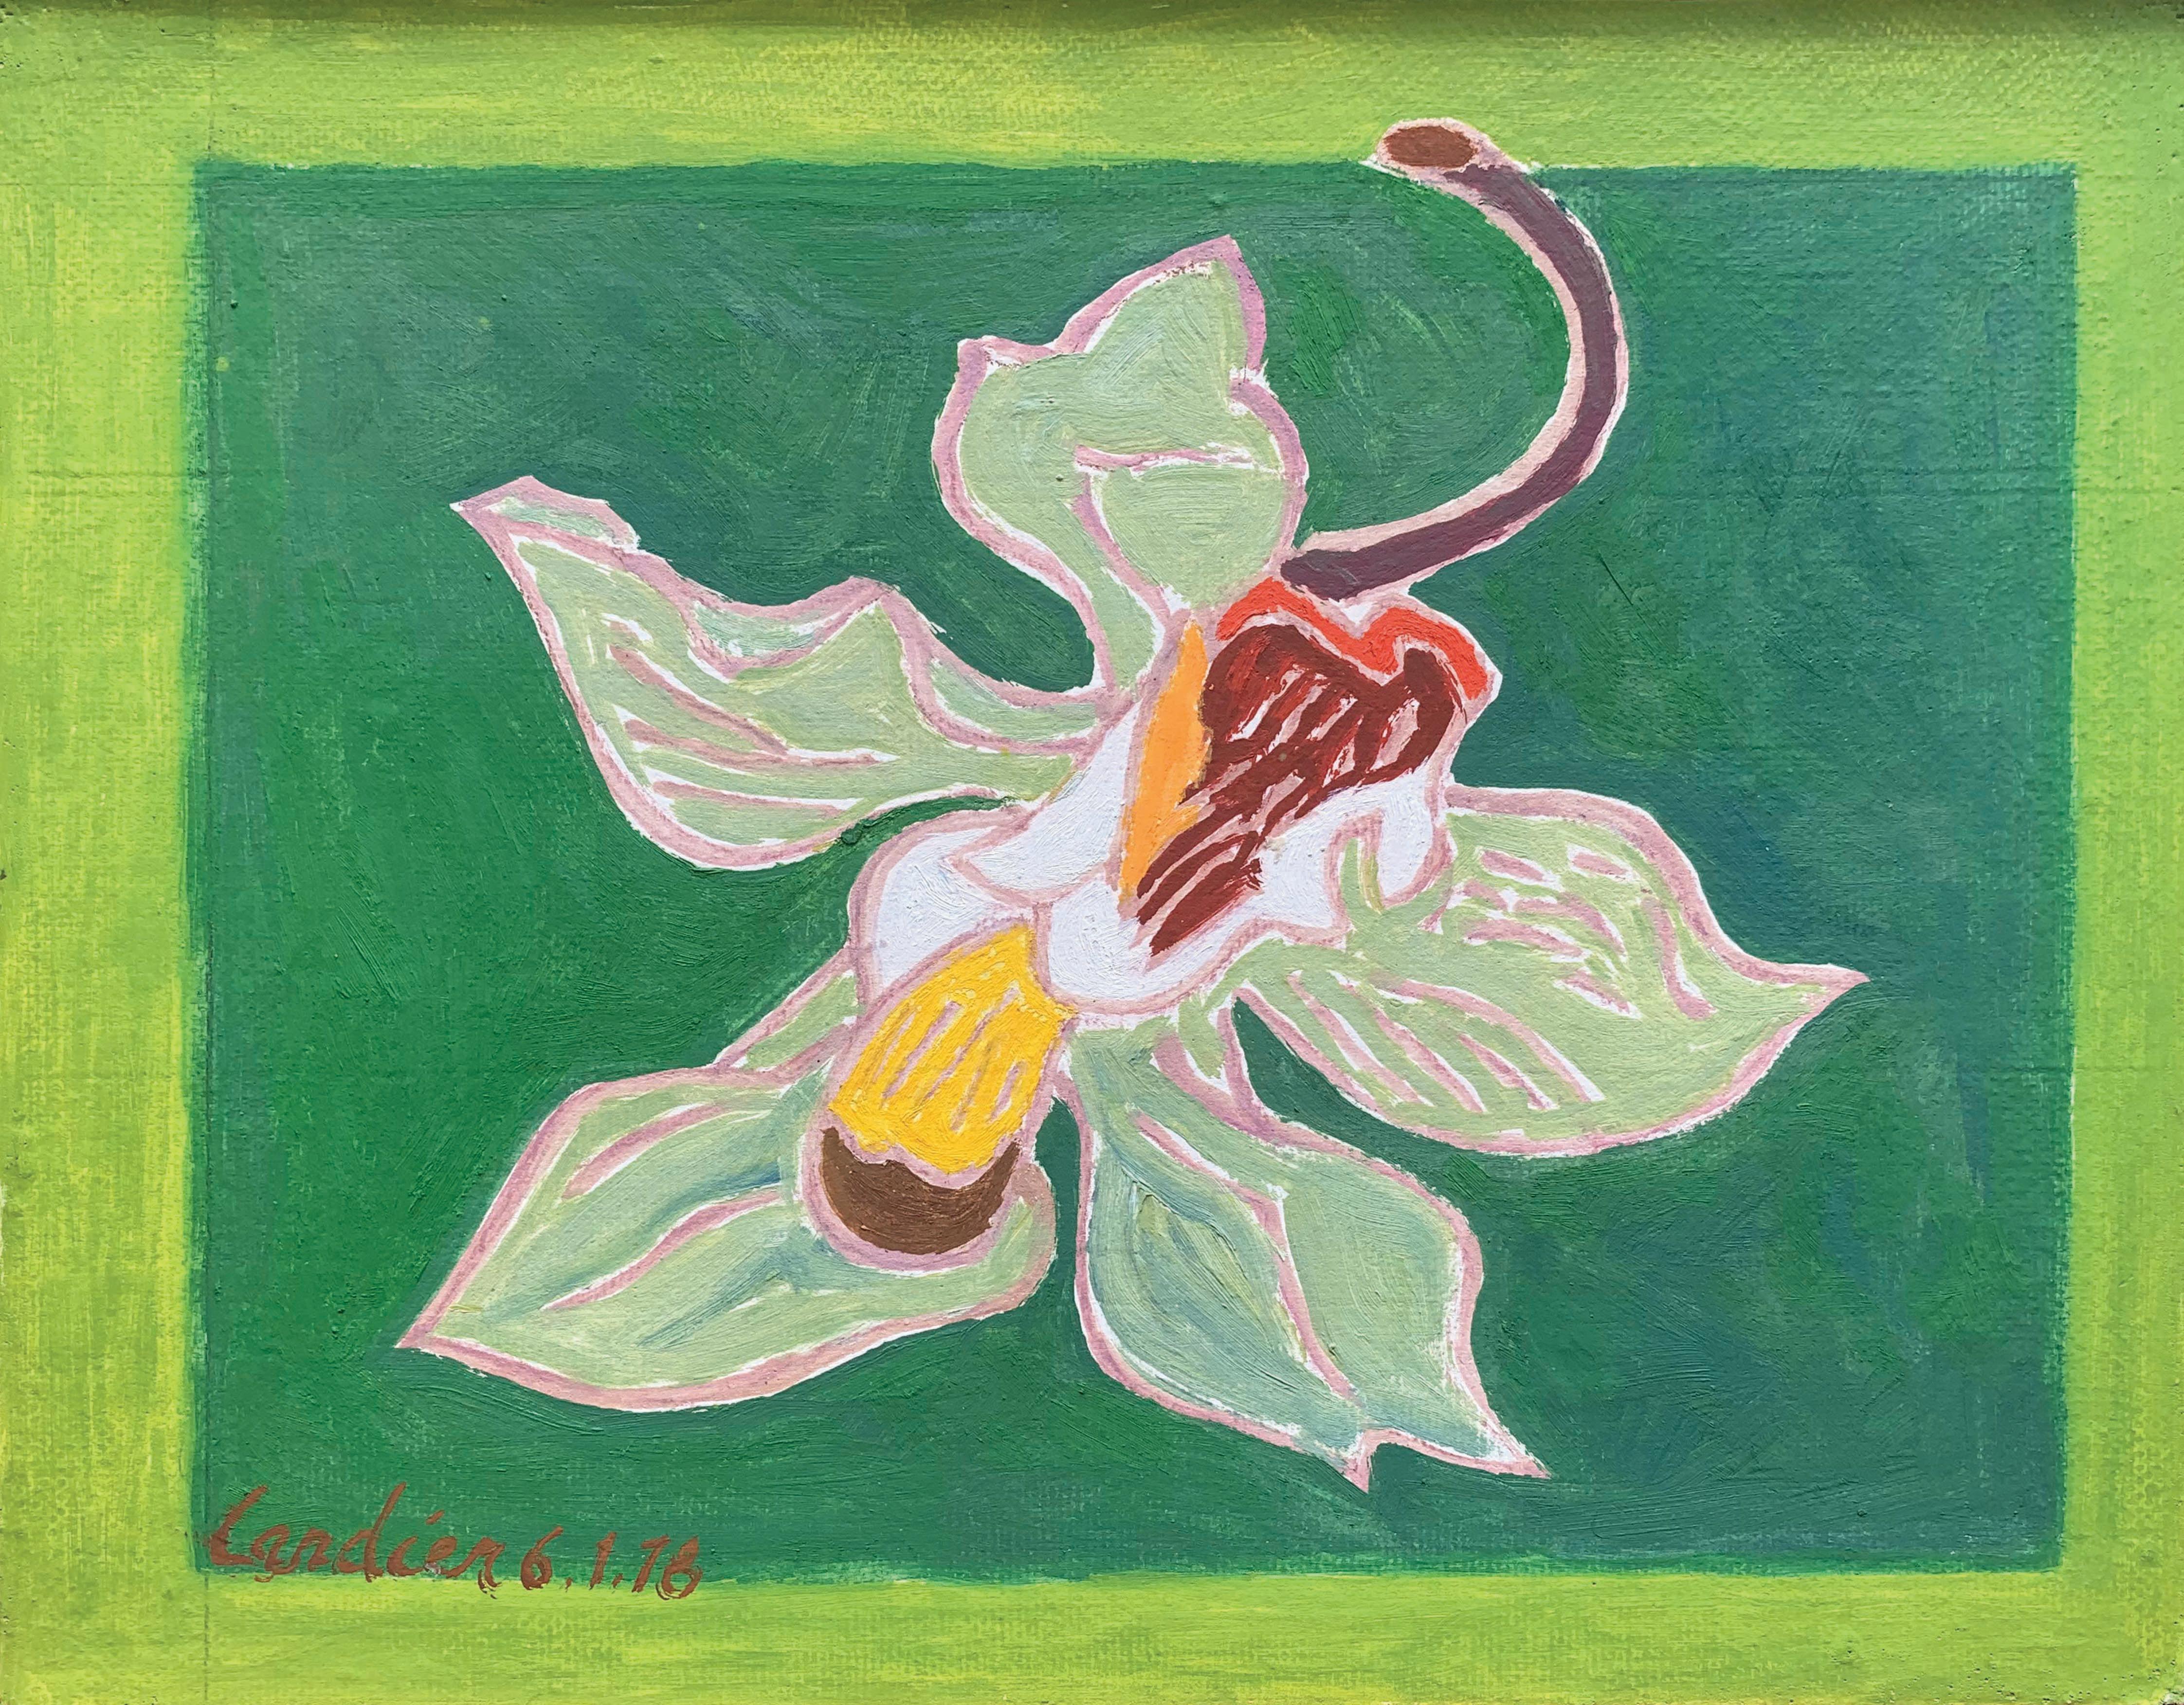 L'orchidee Verte